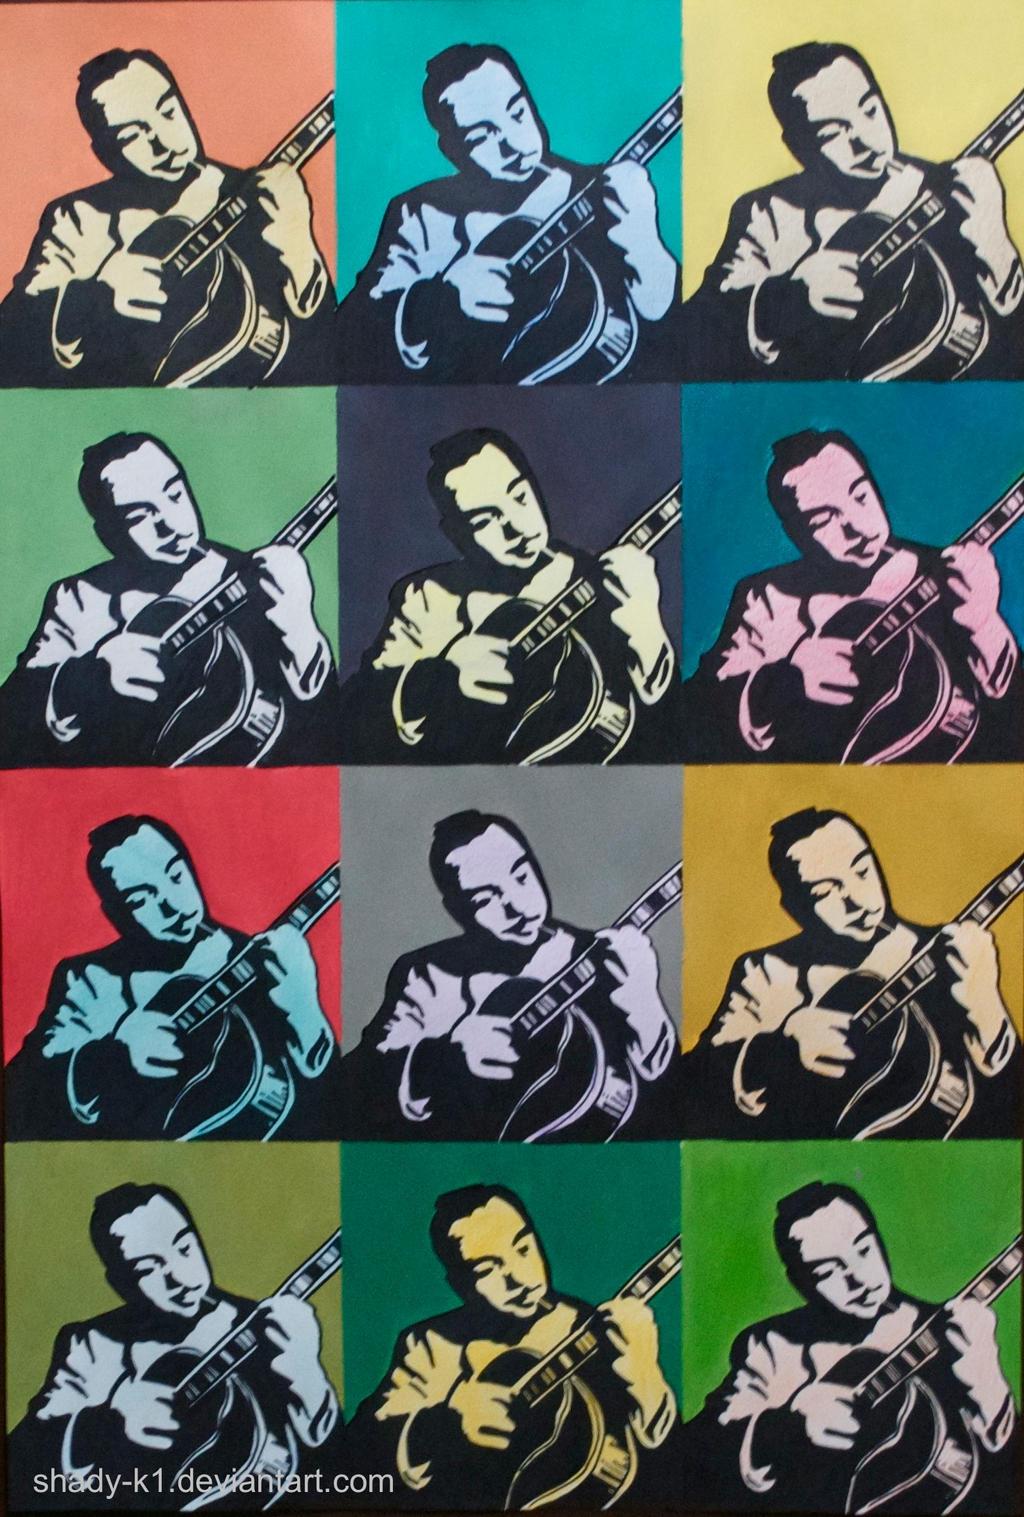 Django Reinhardt Wallpaper besides Musique Au Square Georgia Brown Trio 4975110 additionally St C3 A9phane Grappelli besides Clip Of Babik Reinhardt On Guitar Synth furthermore 72157675026307854. on django reinhardt albums